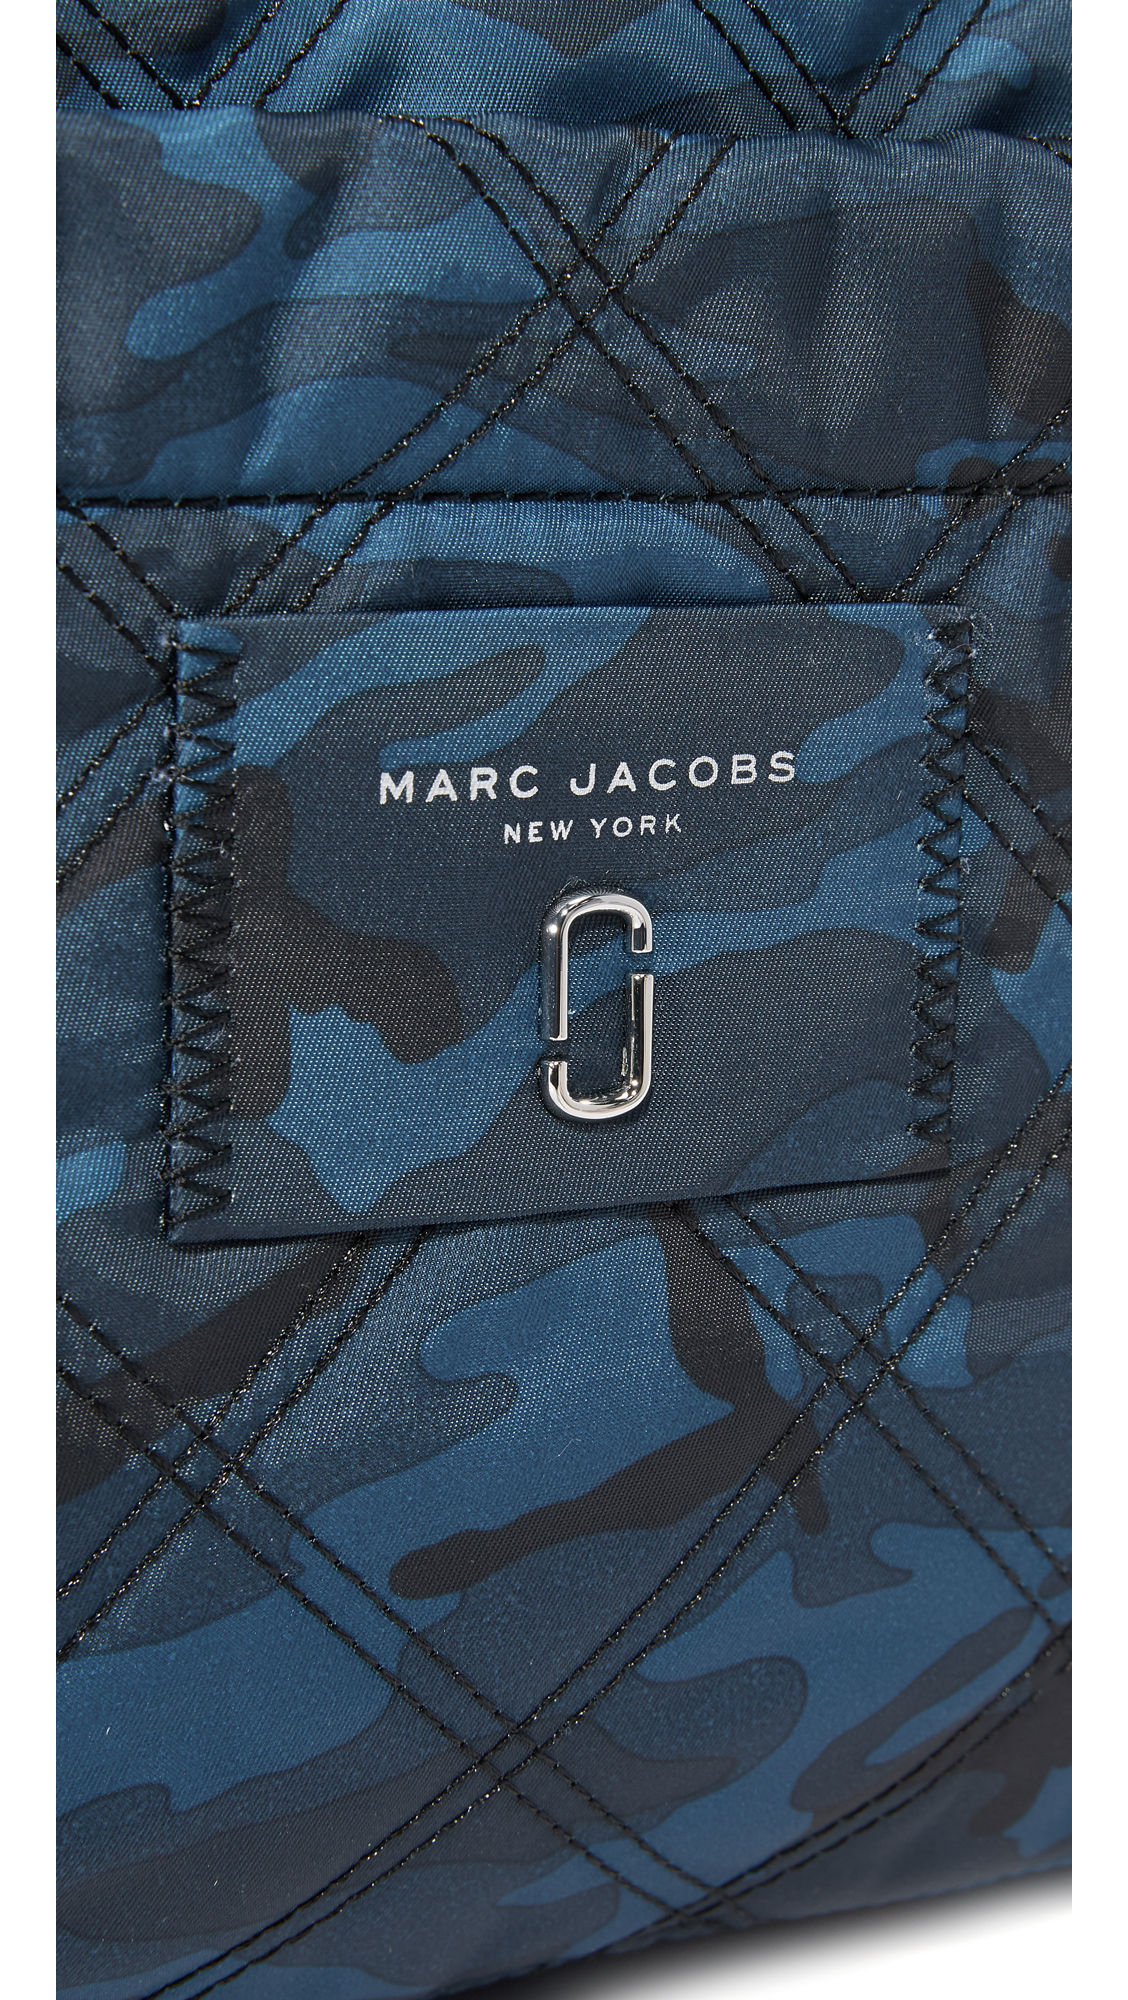 dcb8bc2d9f82 Marc Jacobs Camo Nylon Knot Baby Bag